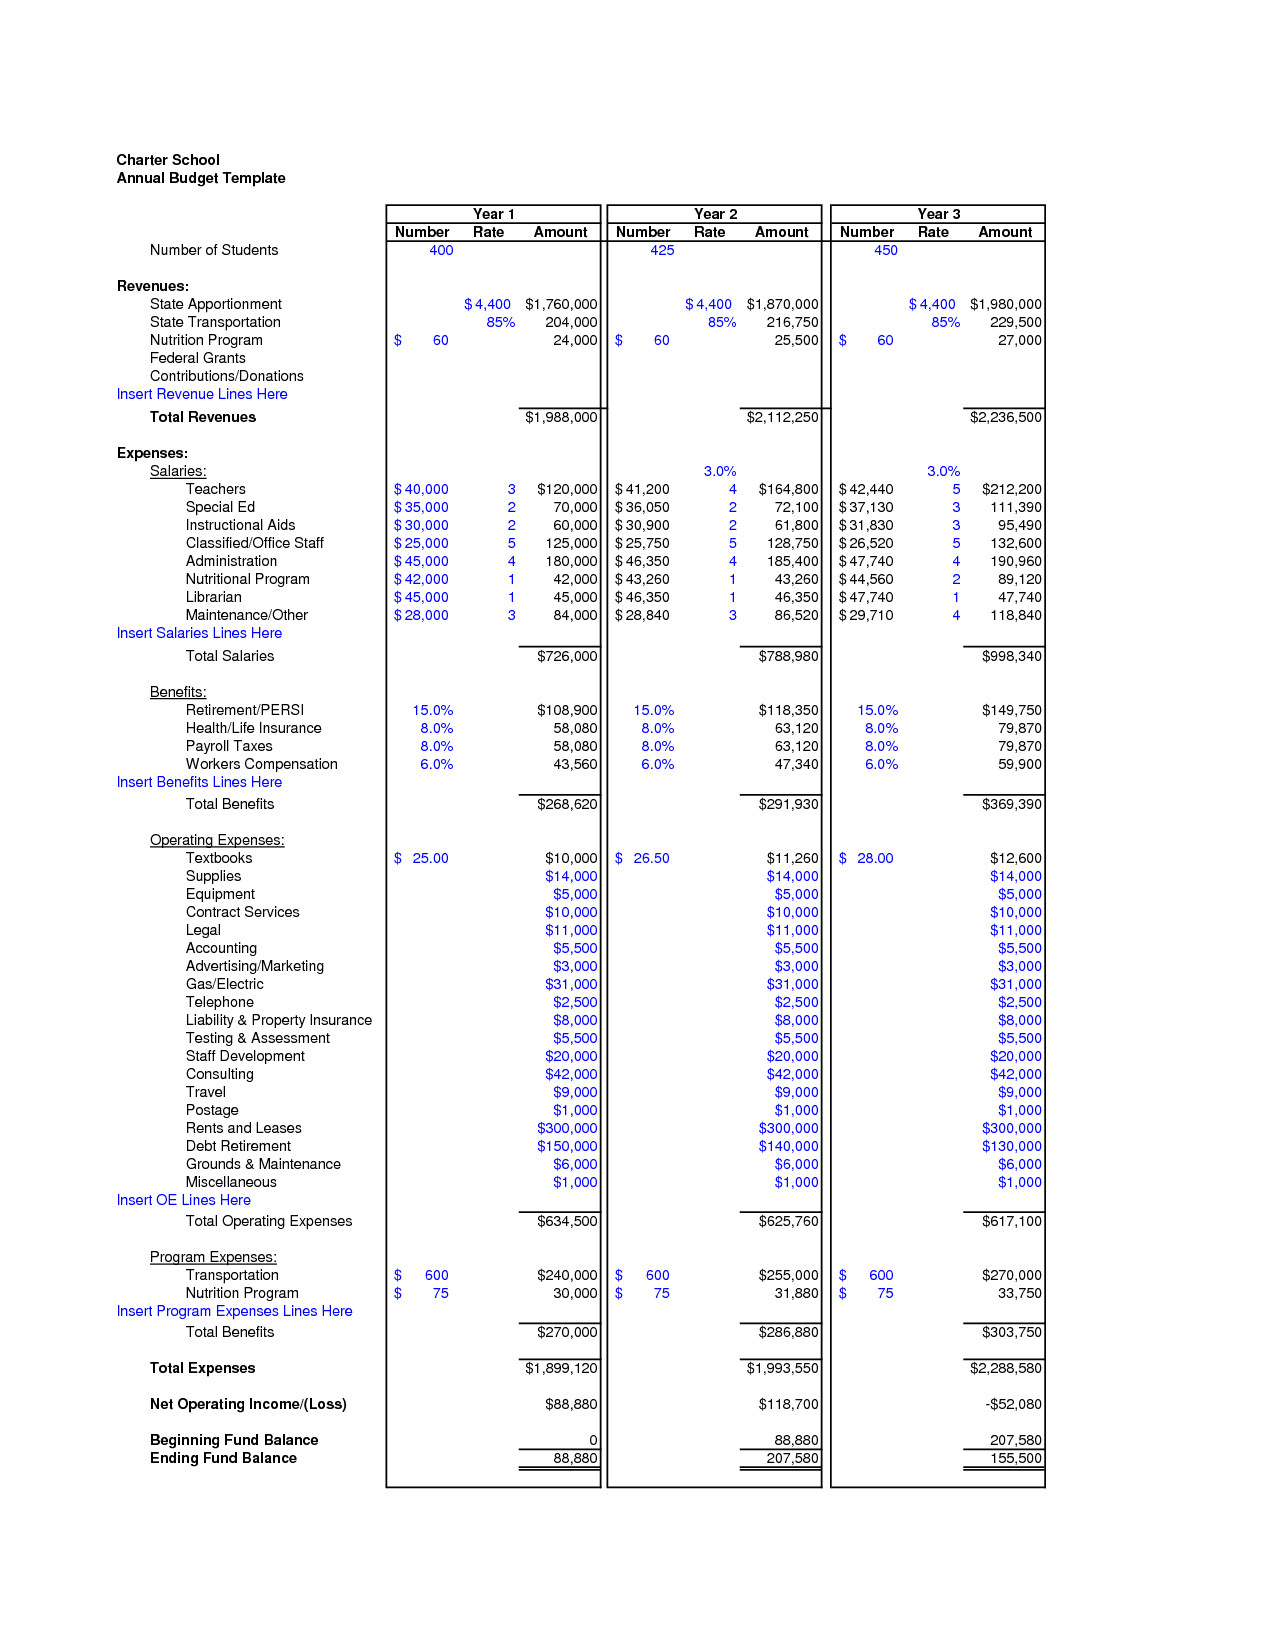 post charter school budget template 100806